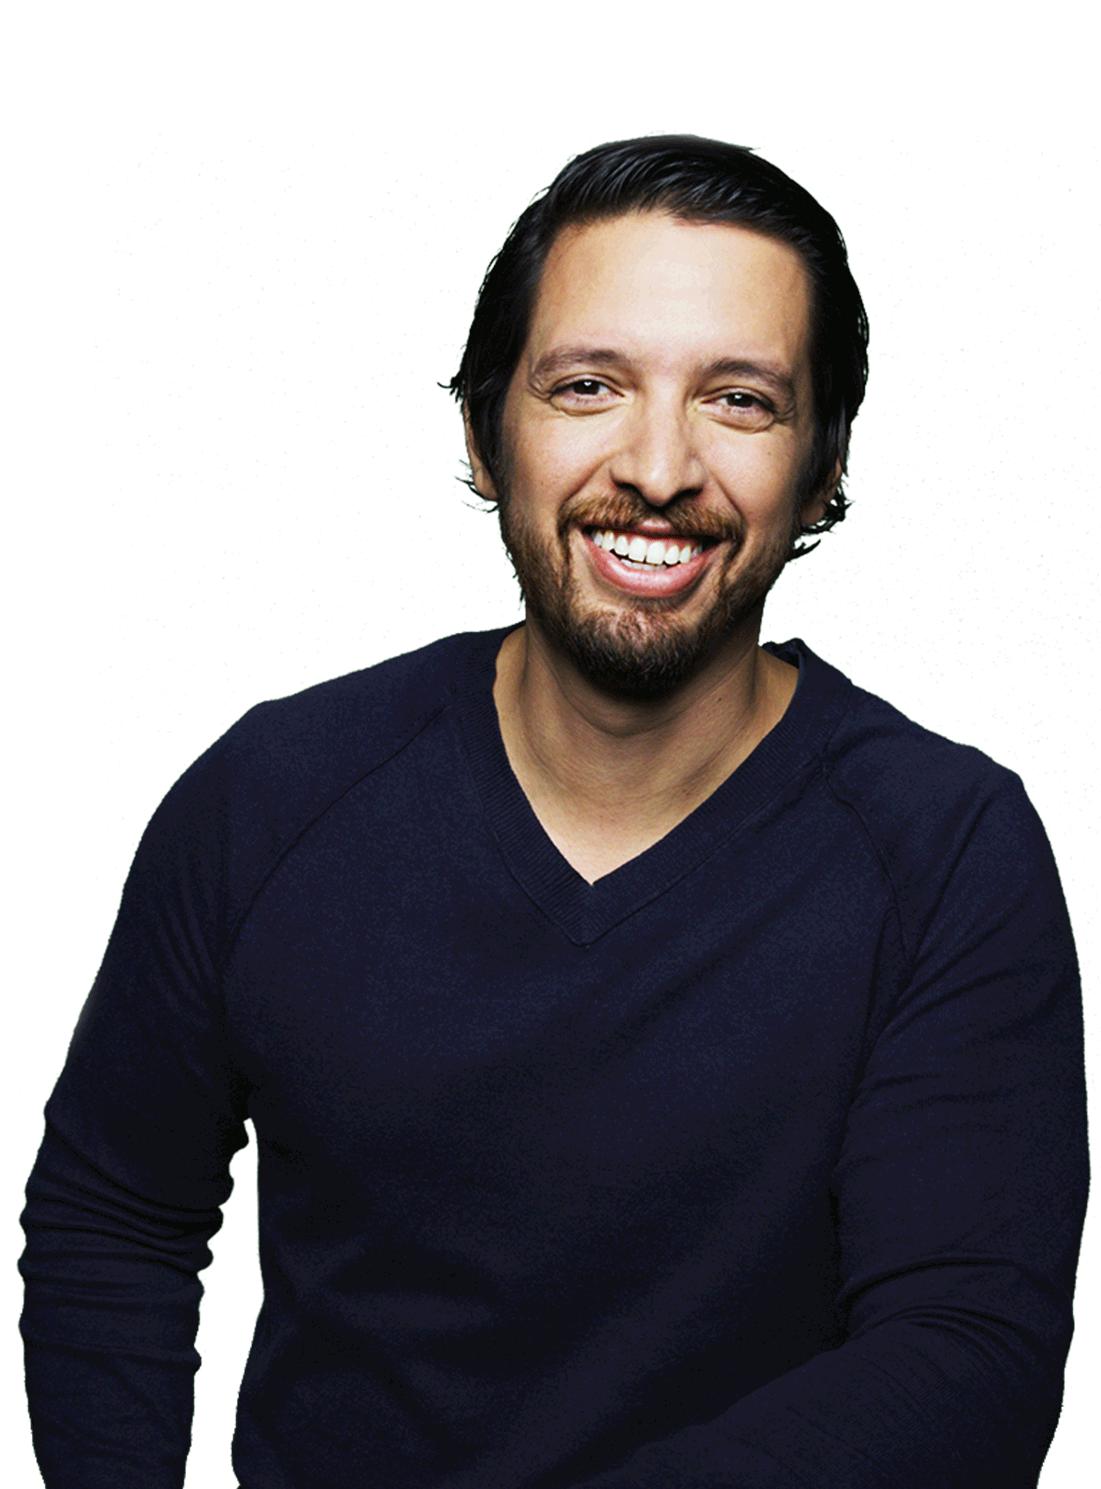 Adrian Sanchez-Murguia